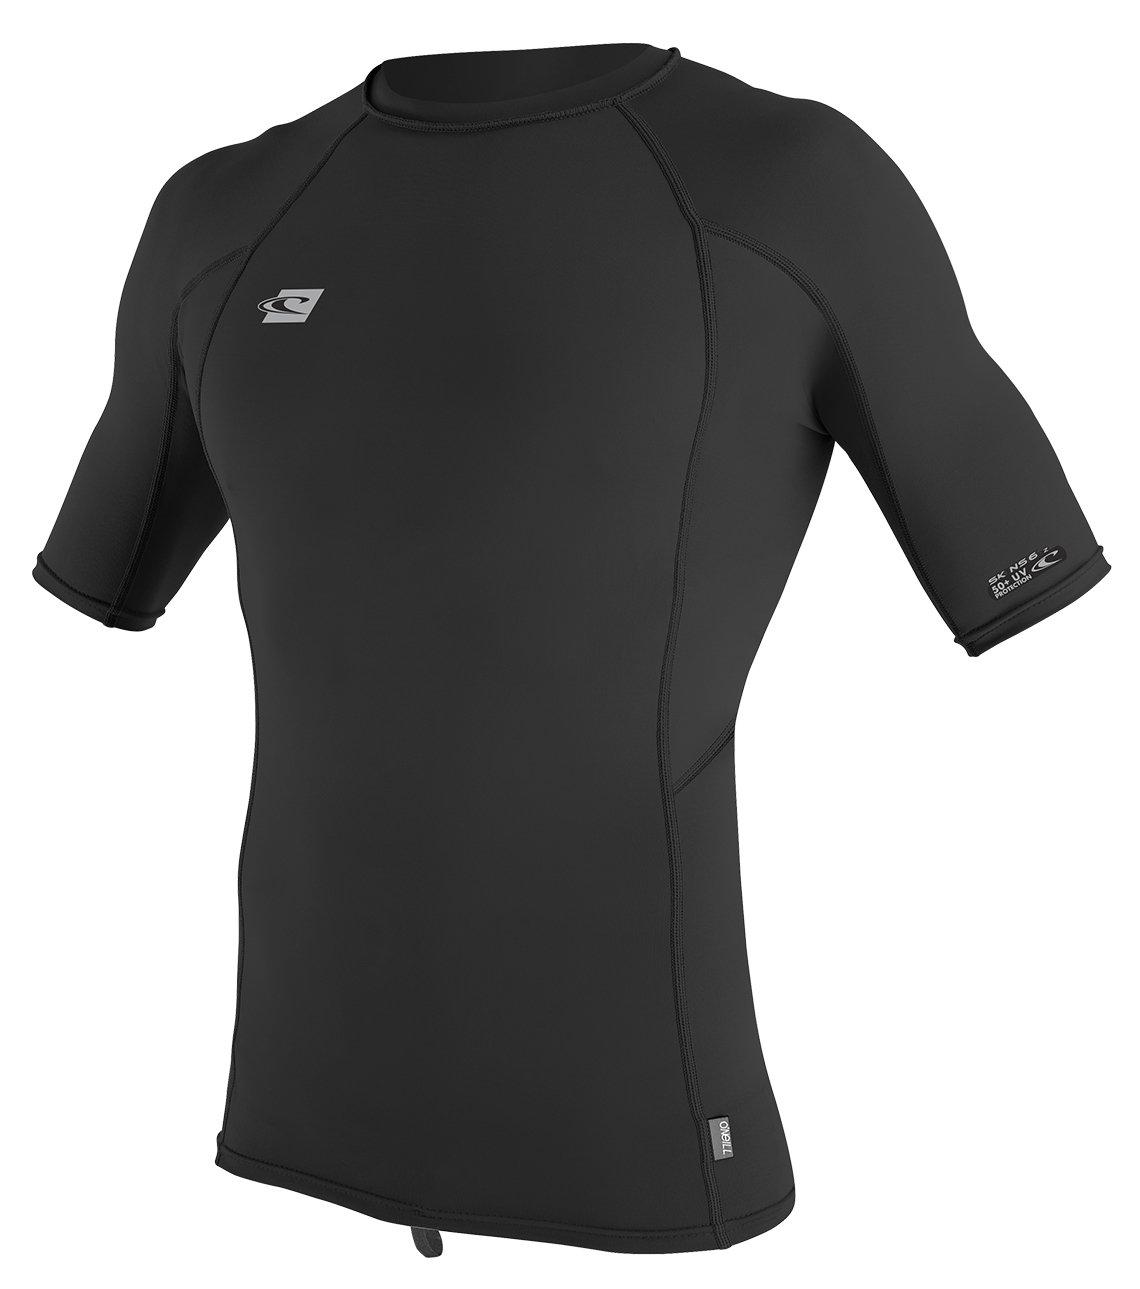 O'Neill Men's Premium Skins UPF 50+ Short Sleeve Rash Guard, Black, X-Small by O'Neill Wetsuits